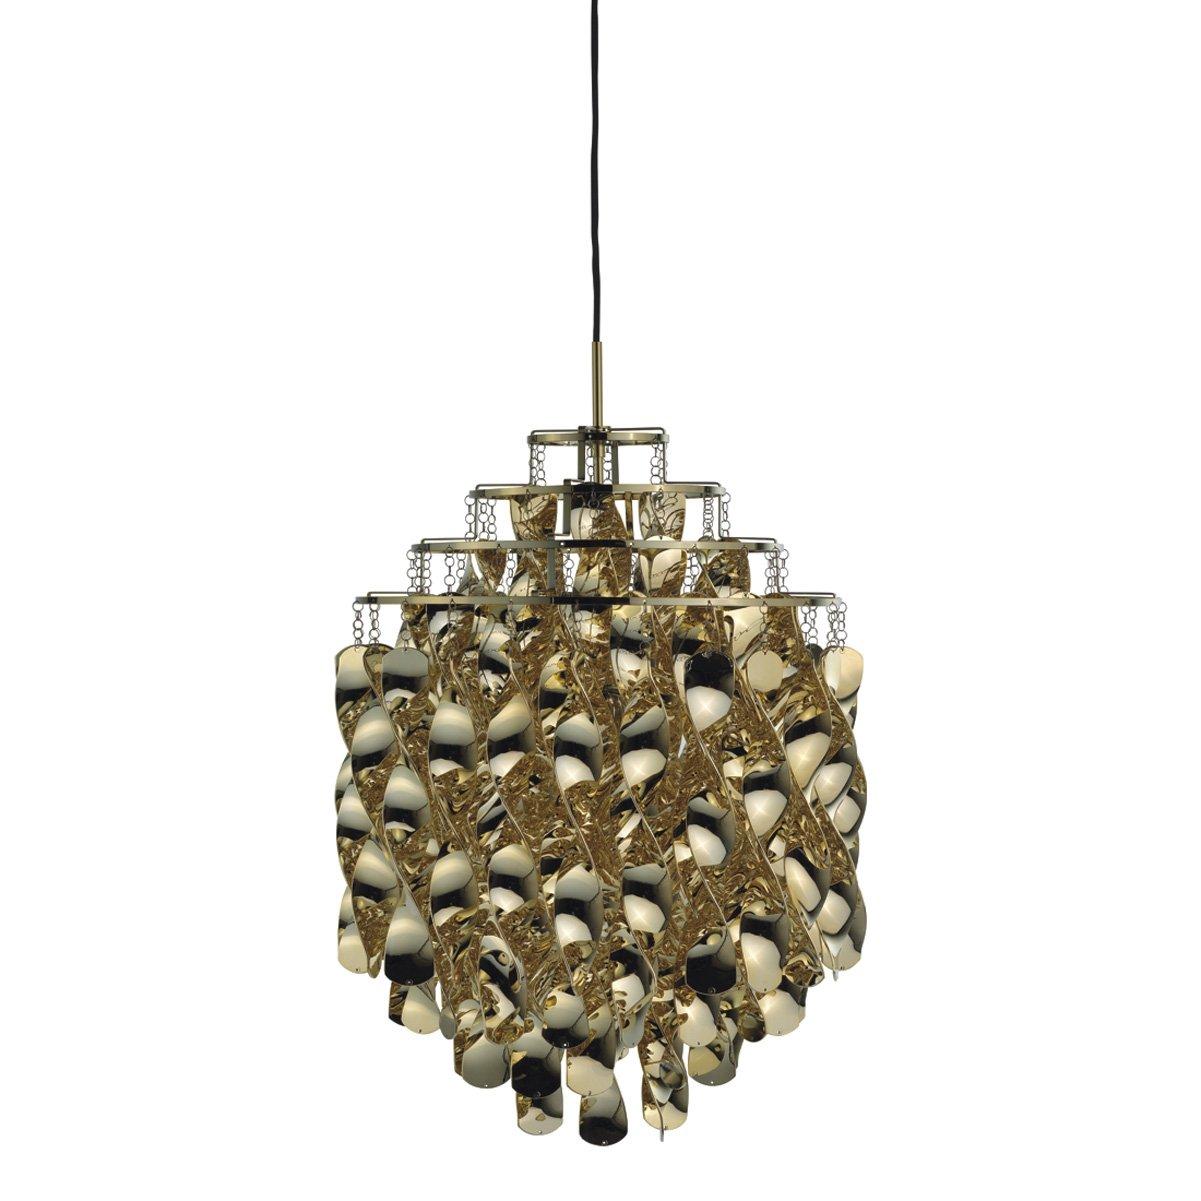 VerPan Pendelleuchte Spiral SP01 (1969) / Gold Cellidor Nylon / ø 45 cm Pendellänge 400 cm 10705555001036